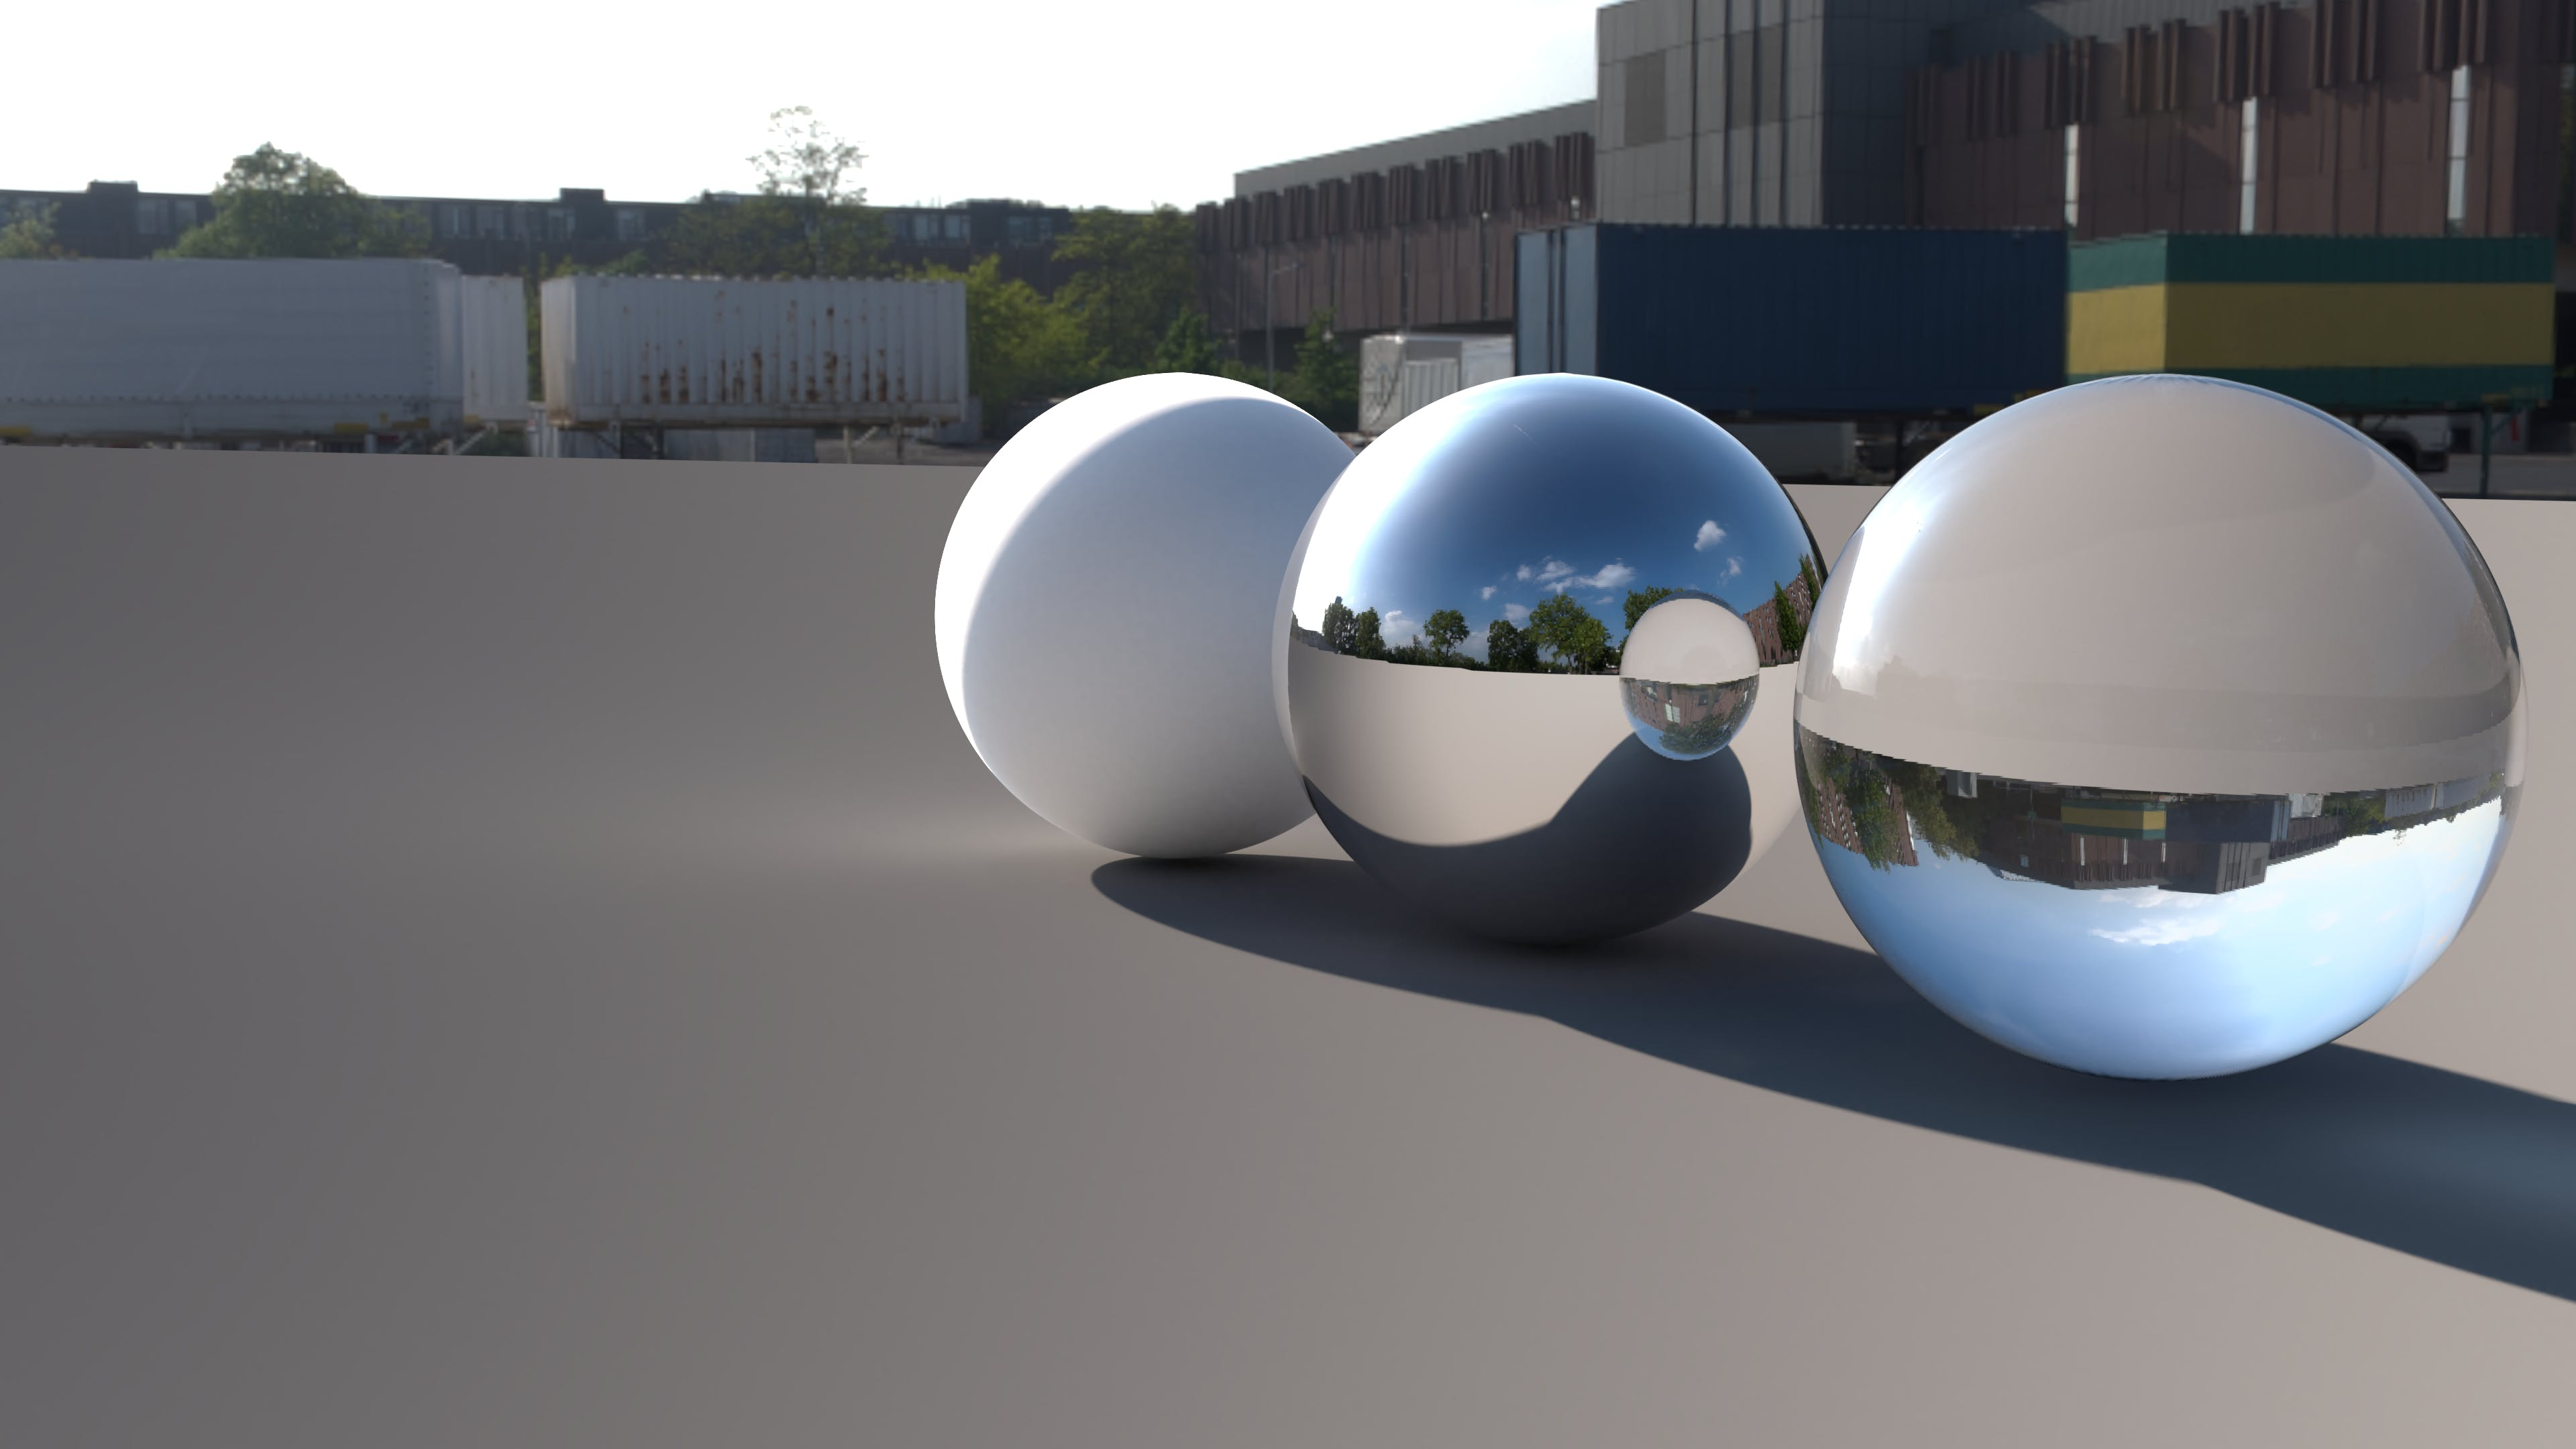 3 Balls, wallpaper